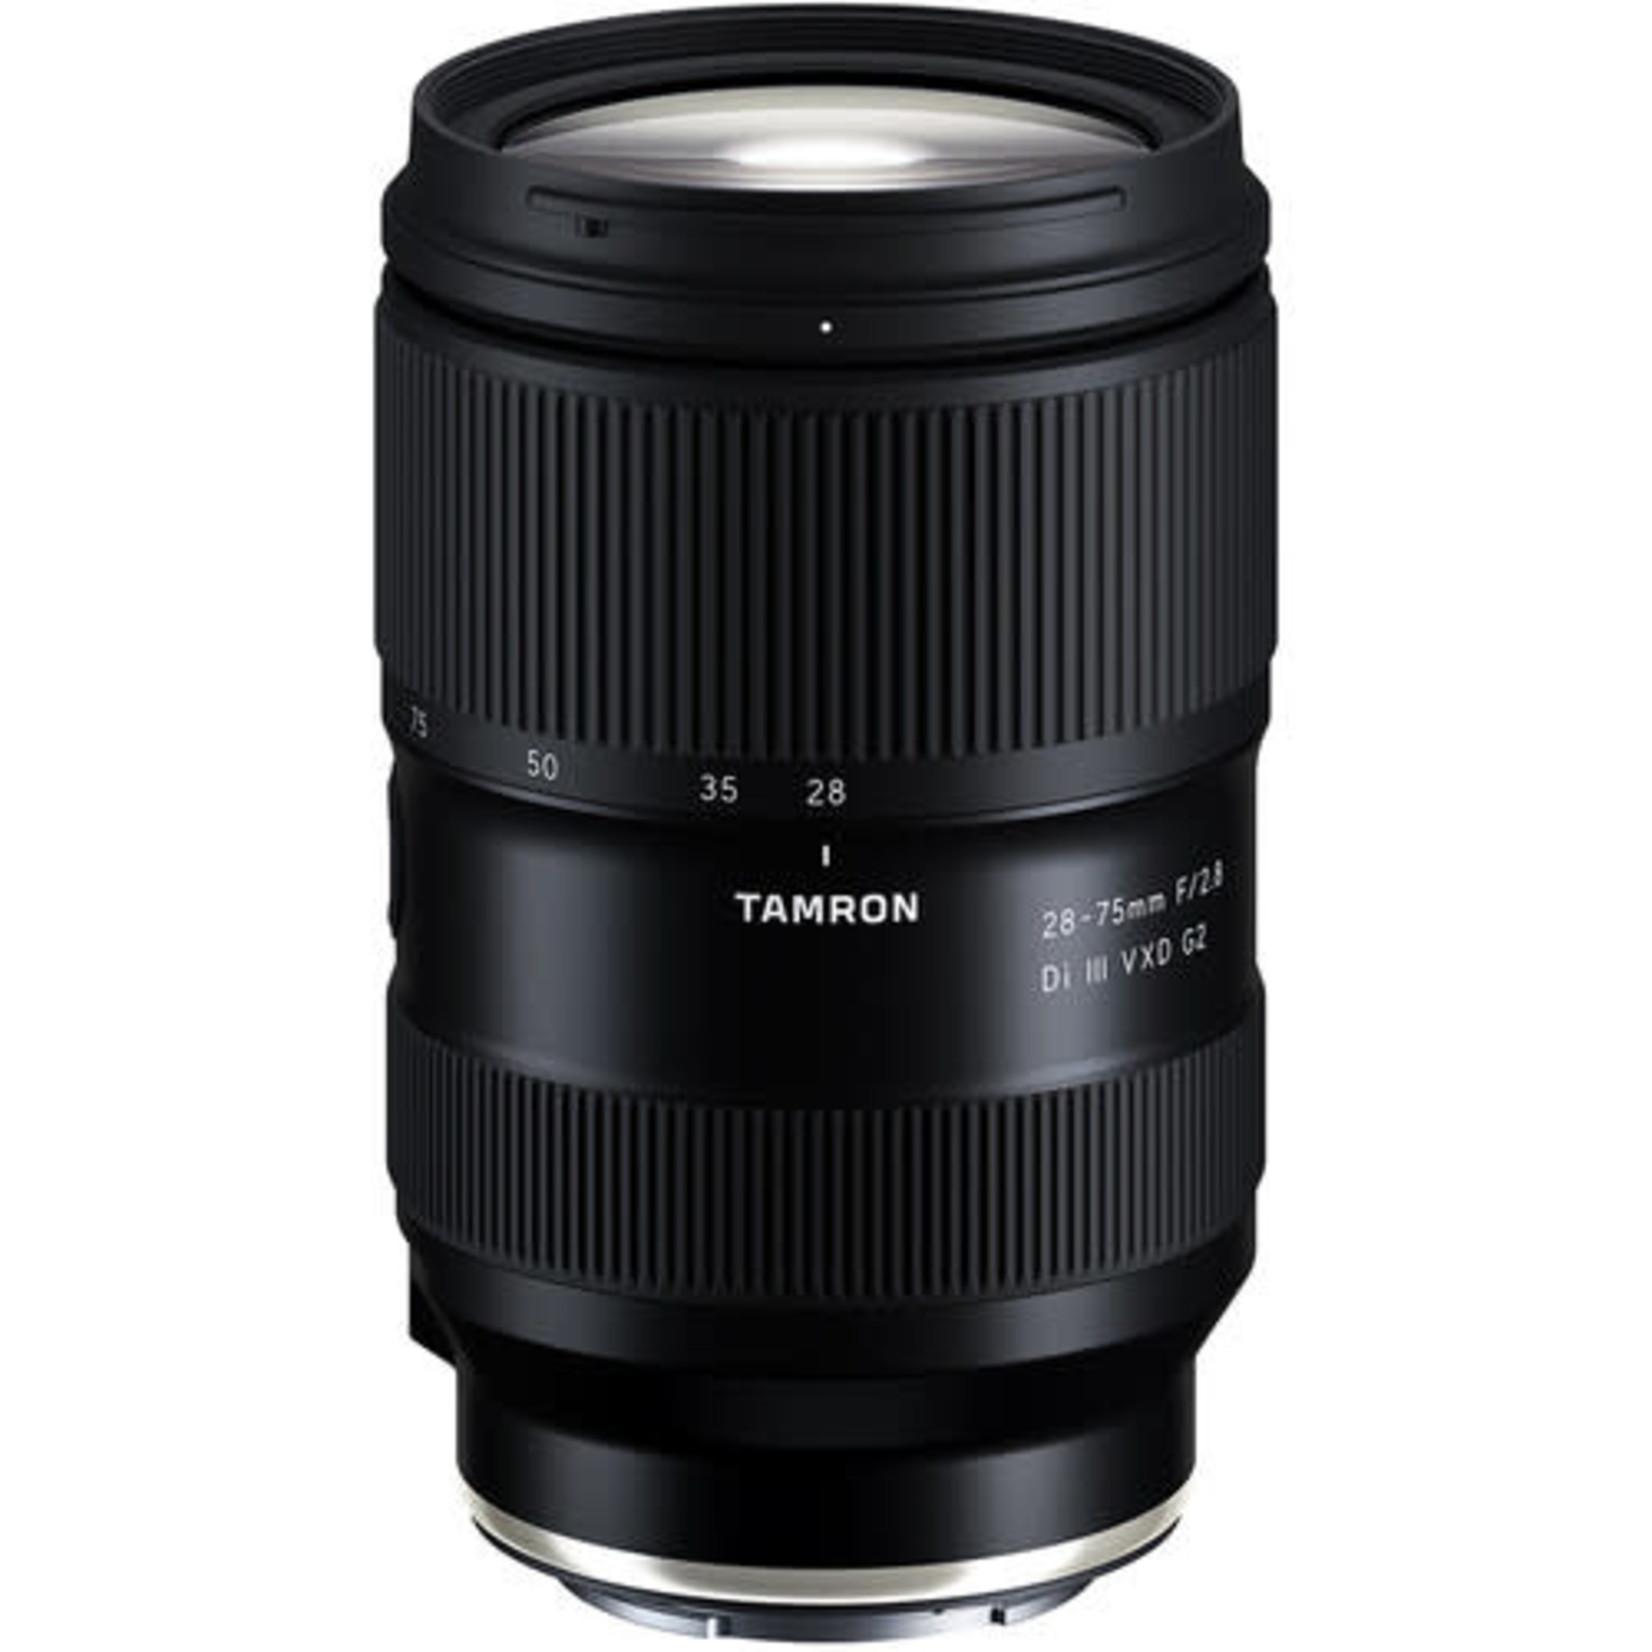 Tamron Tamron 28-75mm f/2.8 Di III VXD G2 Lens for Sony E